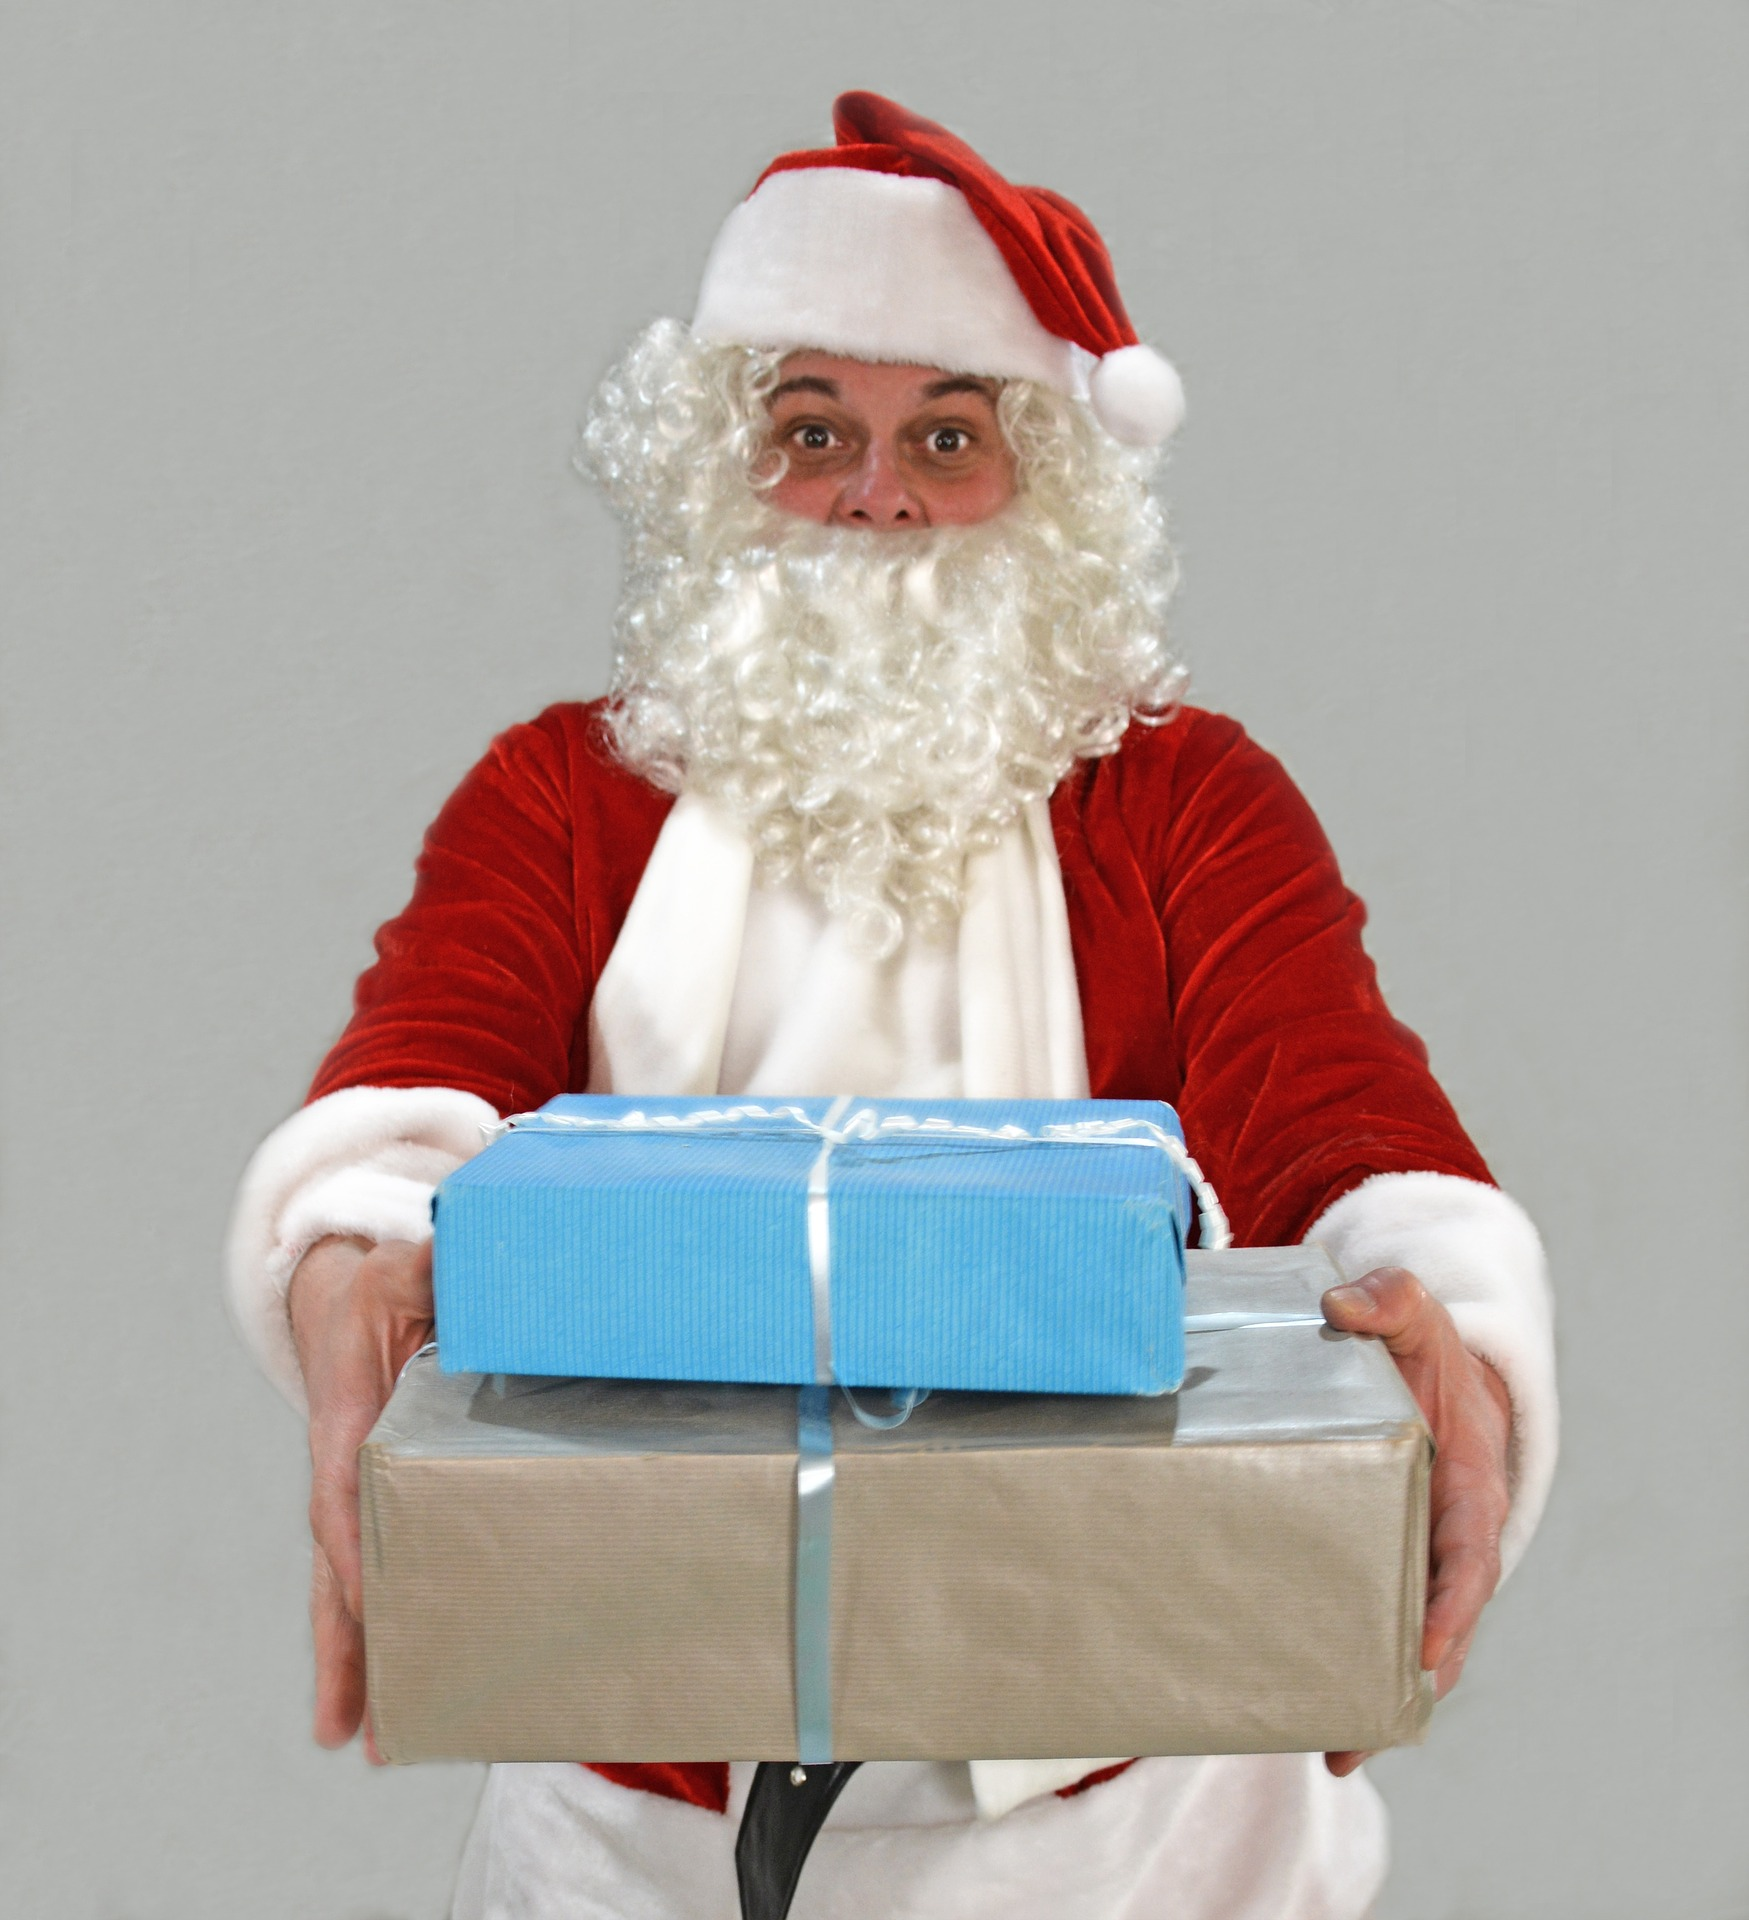 Dirty Santa Gift Exchange Ideas